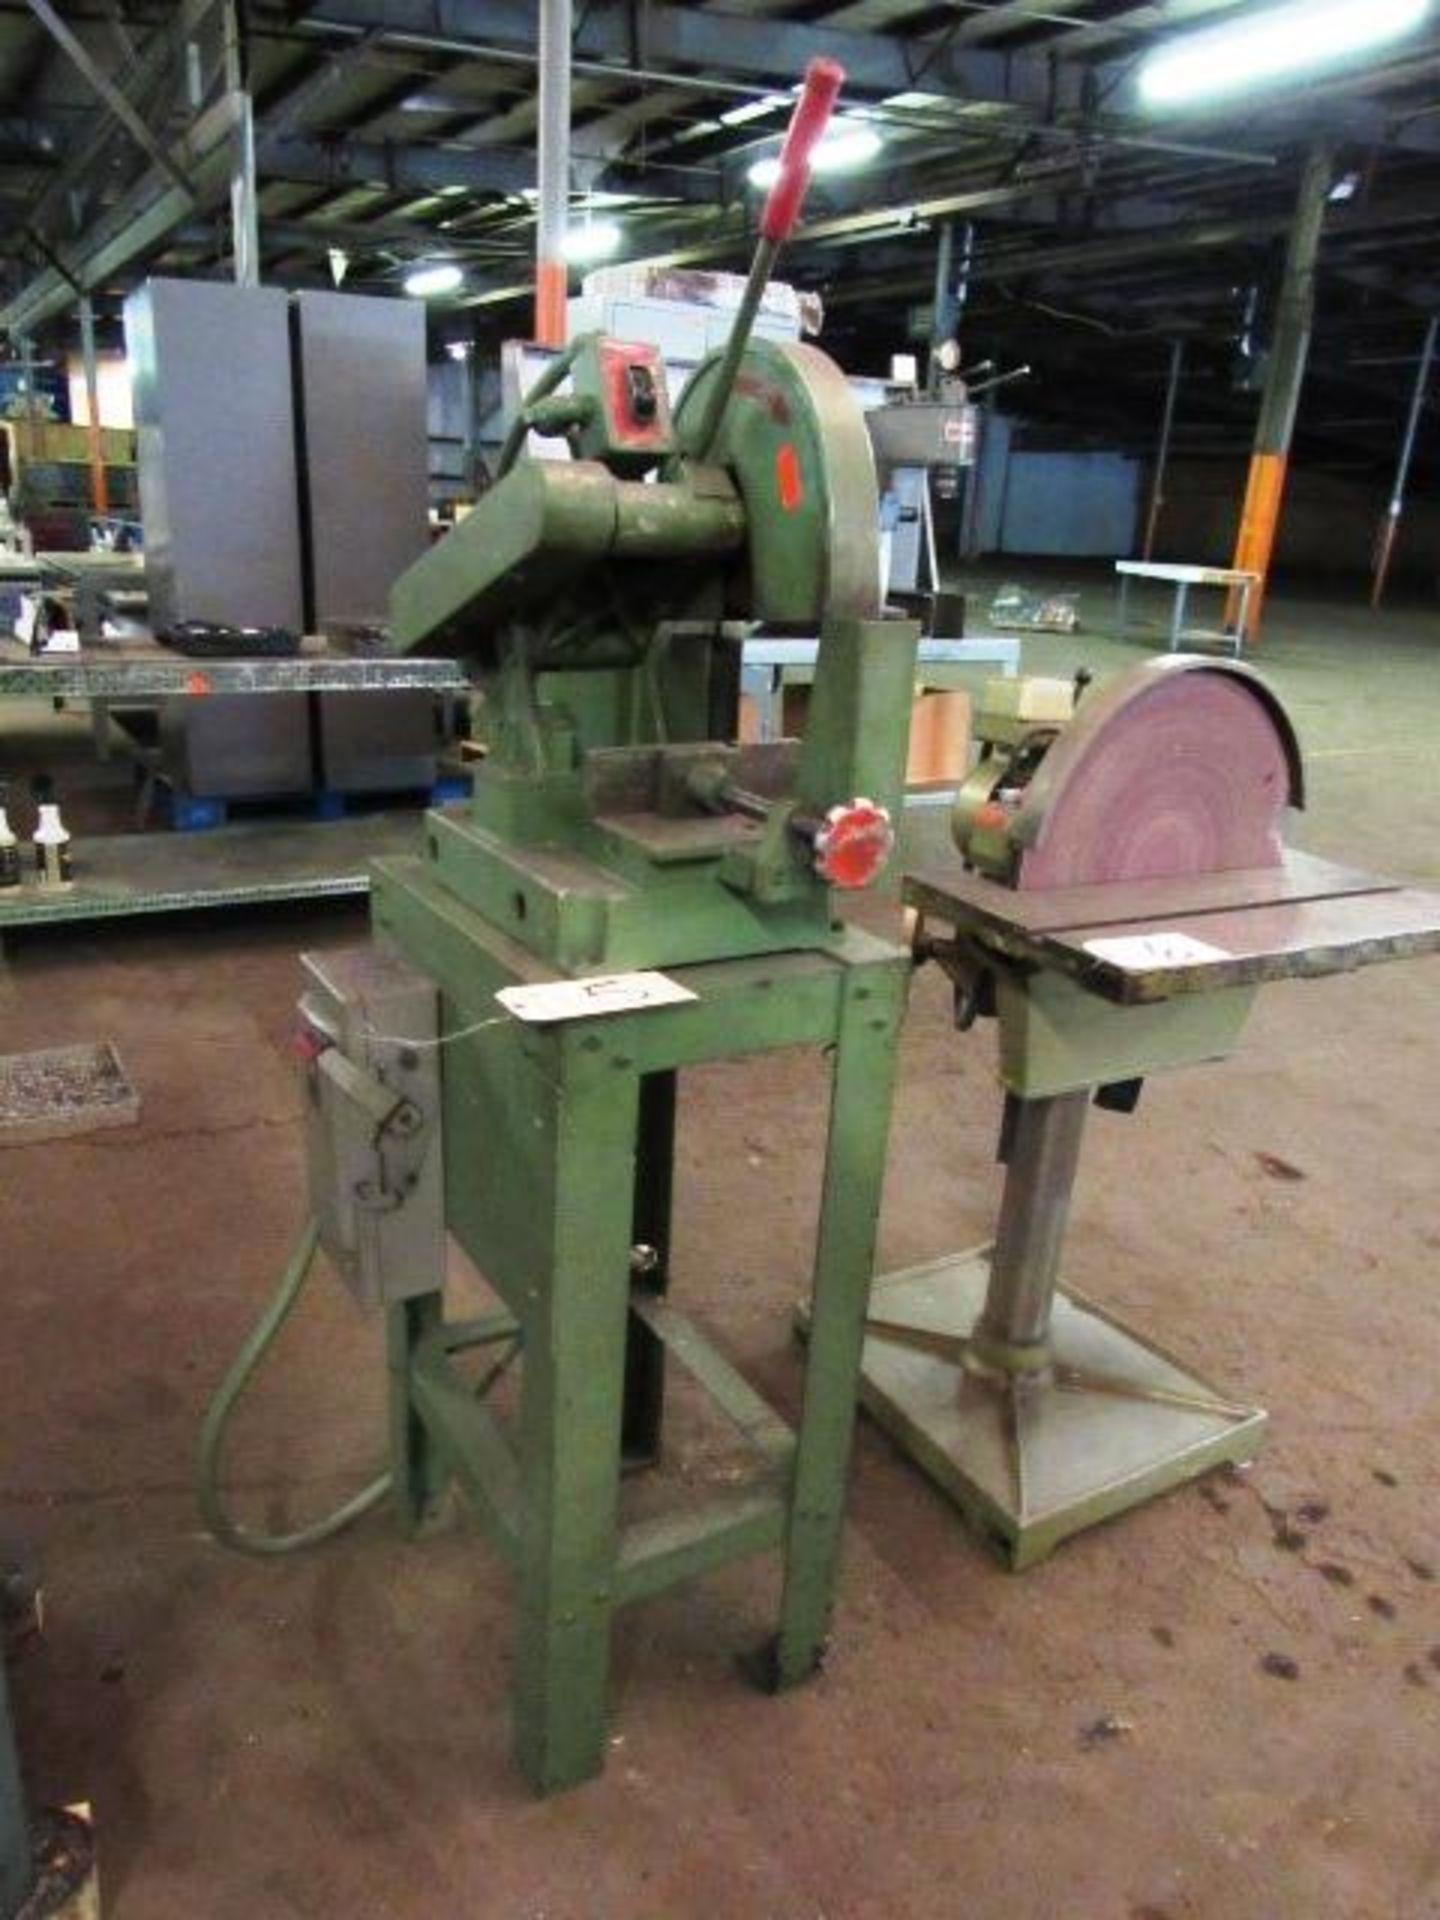 Lot 5 - Toledo-Beaver-Tool Co. Speed Cut #110 Abrasive Chop Saw, sn:110-600-00897